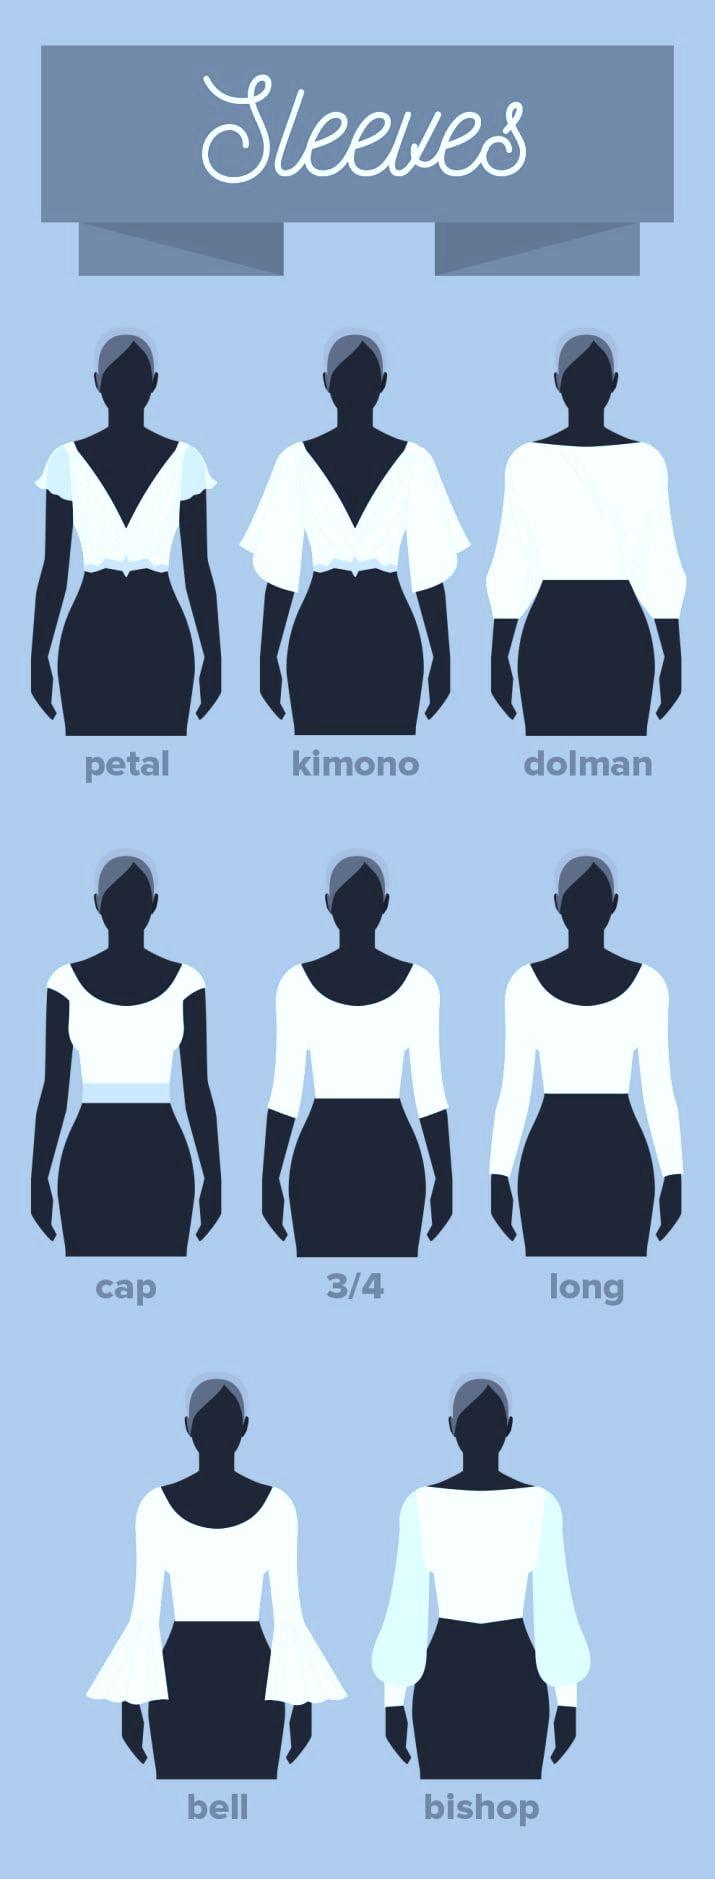 some popular sleeve shape options. -